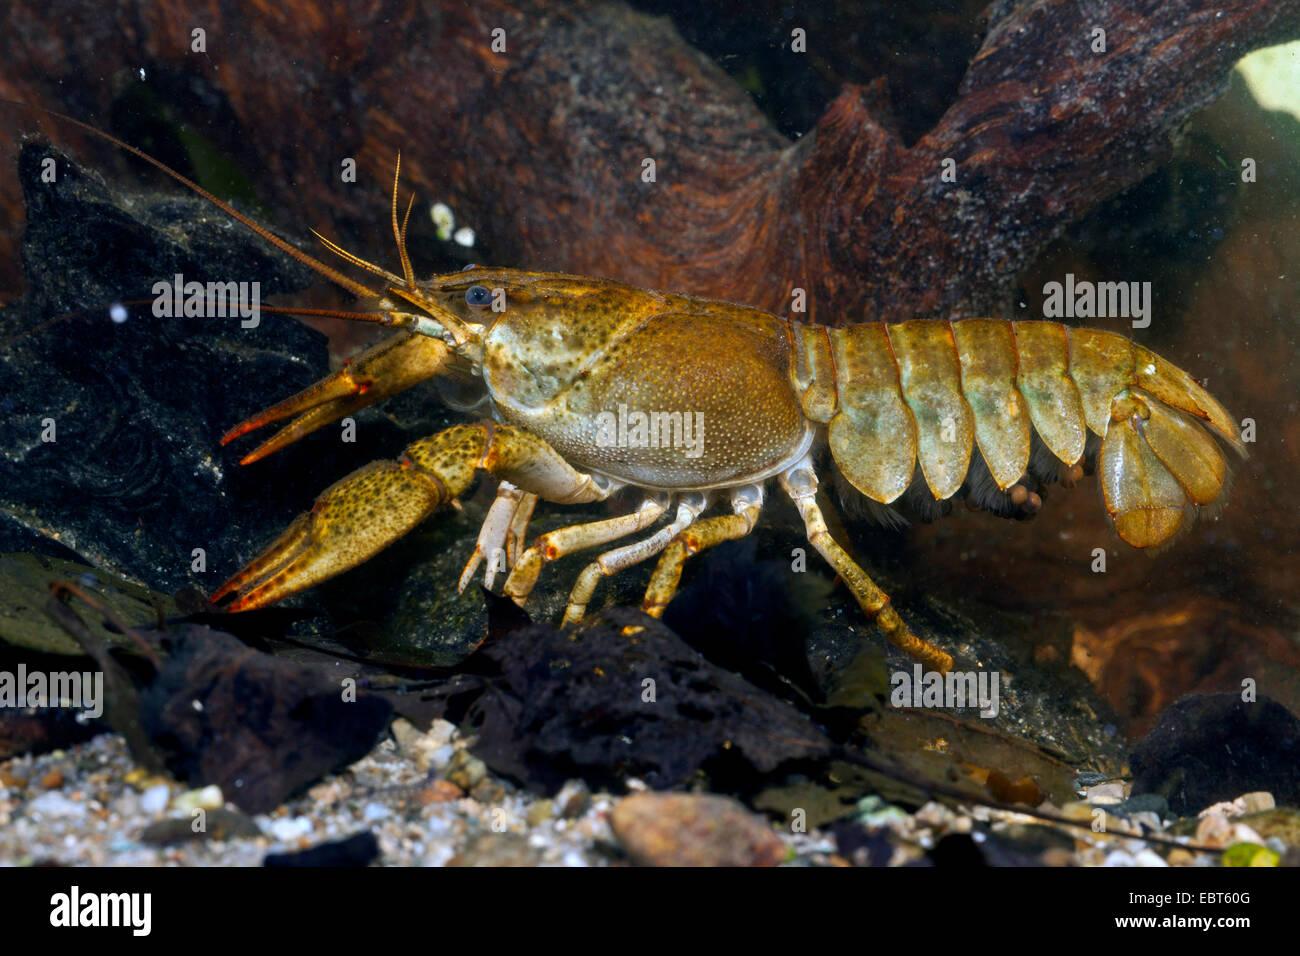 long-clawed crayfish (Astacus leptodactylus), female, abdomen with eggs - Stock Image